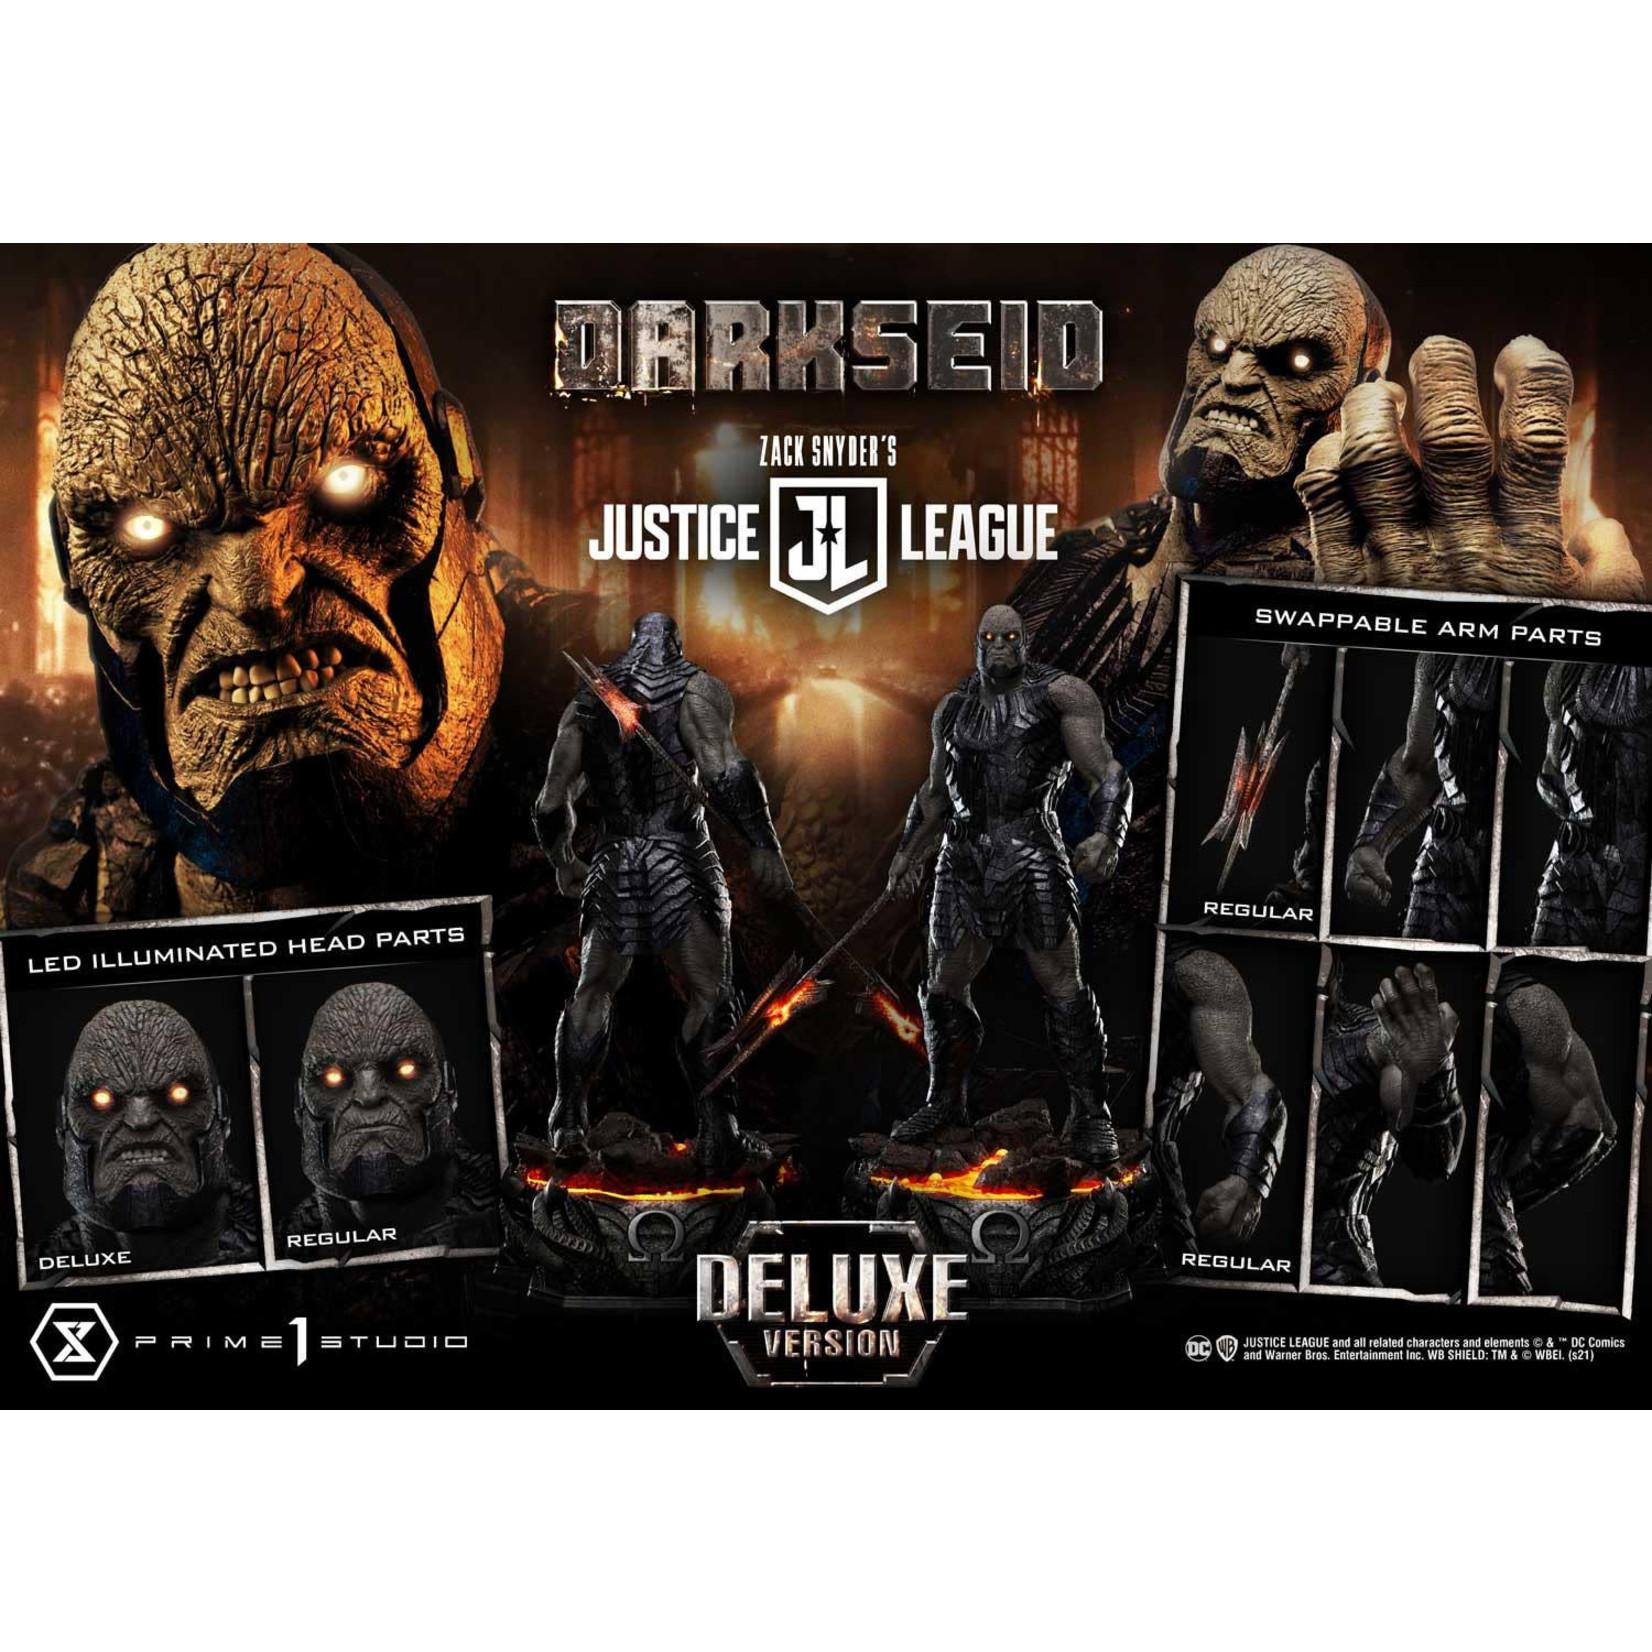 Prime 1 Studio [PRECOMMANDE] MMJL-08DX: DARKSEID DELUXE BONUS VERSION (ZACK SNYDER'S JUSTICE LEAGUE)